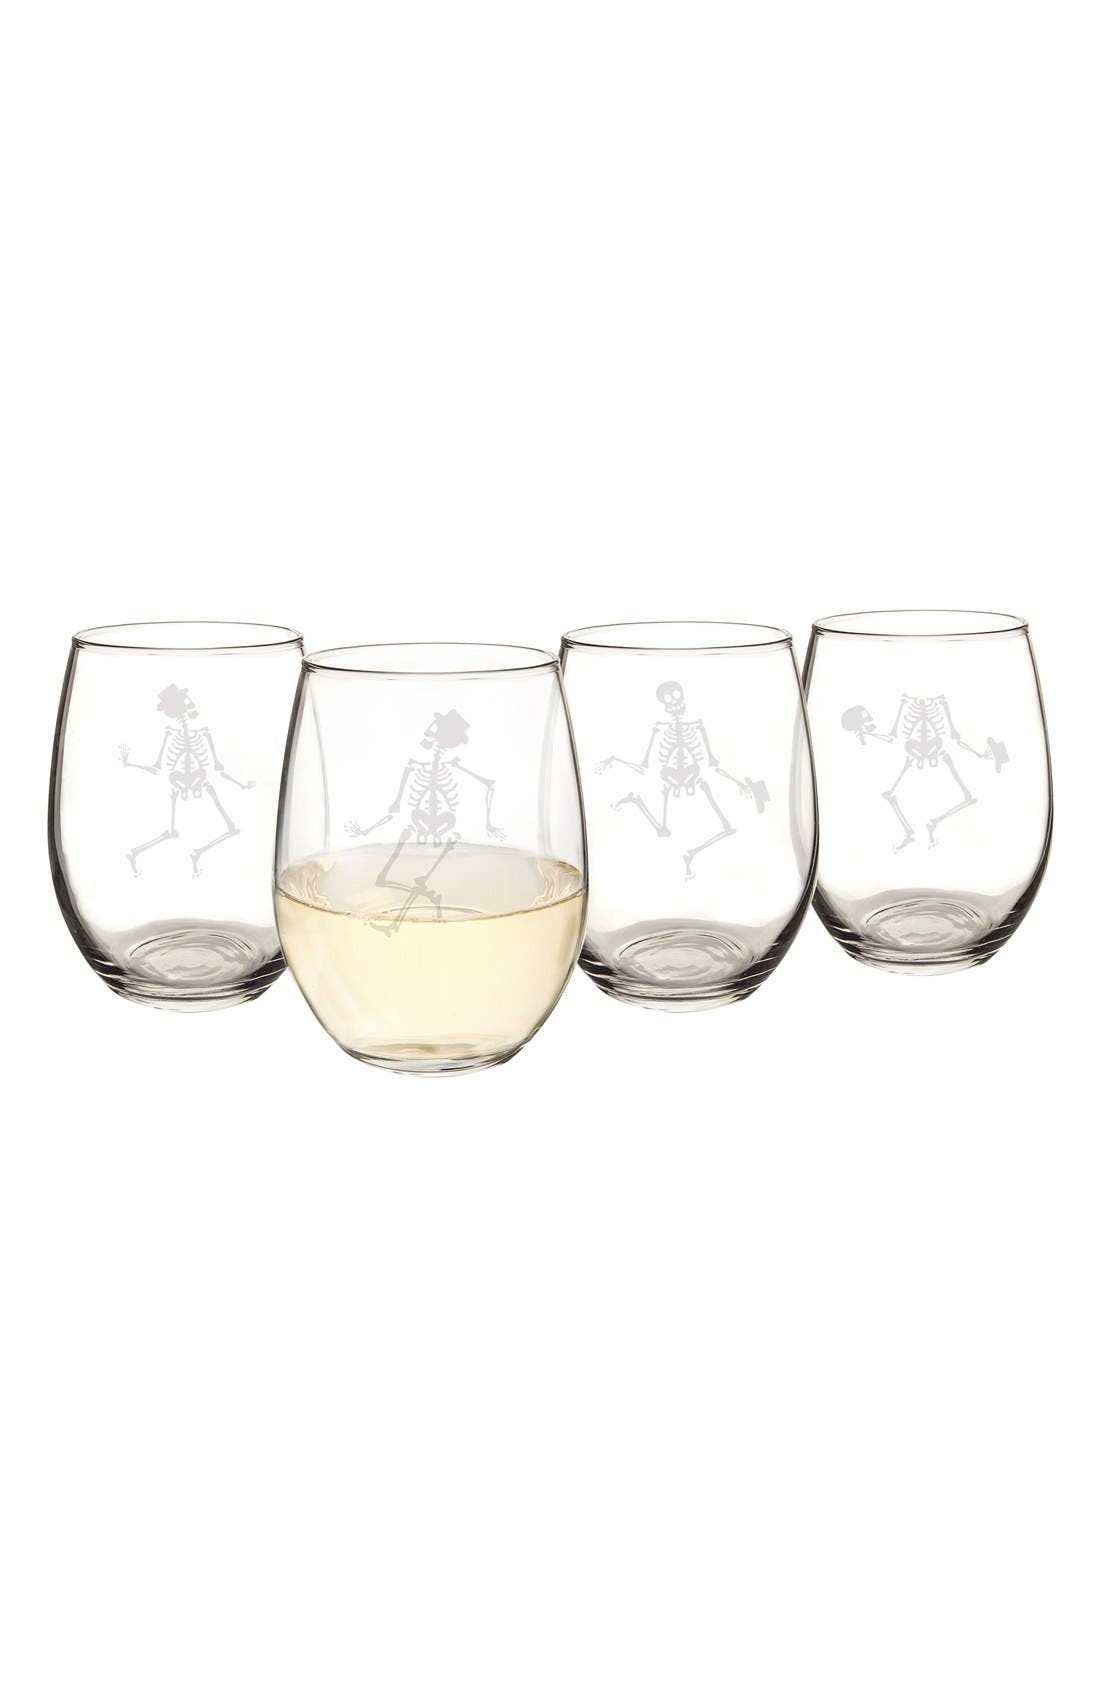 Skeletons Set of 4 Stemless Wine Glasses,                             Alternate thumbnail 3, color,                             Clear